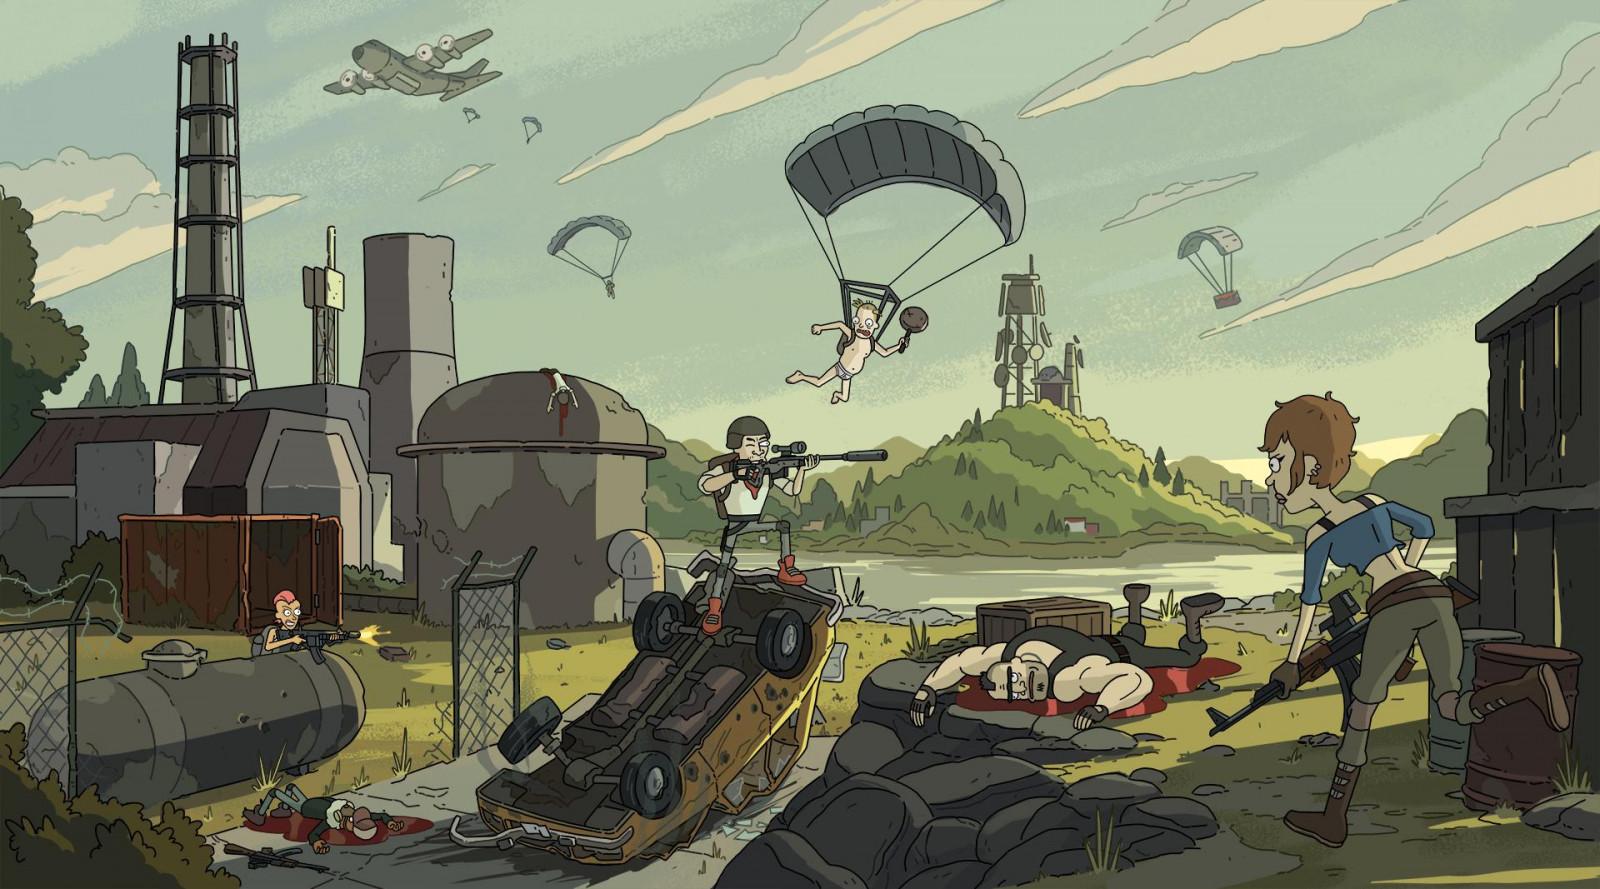 Wallpaper : Video Games, Digital Art, PUBG, Cartoon, Gun